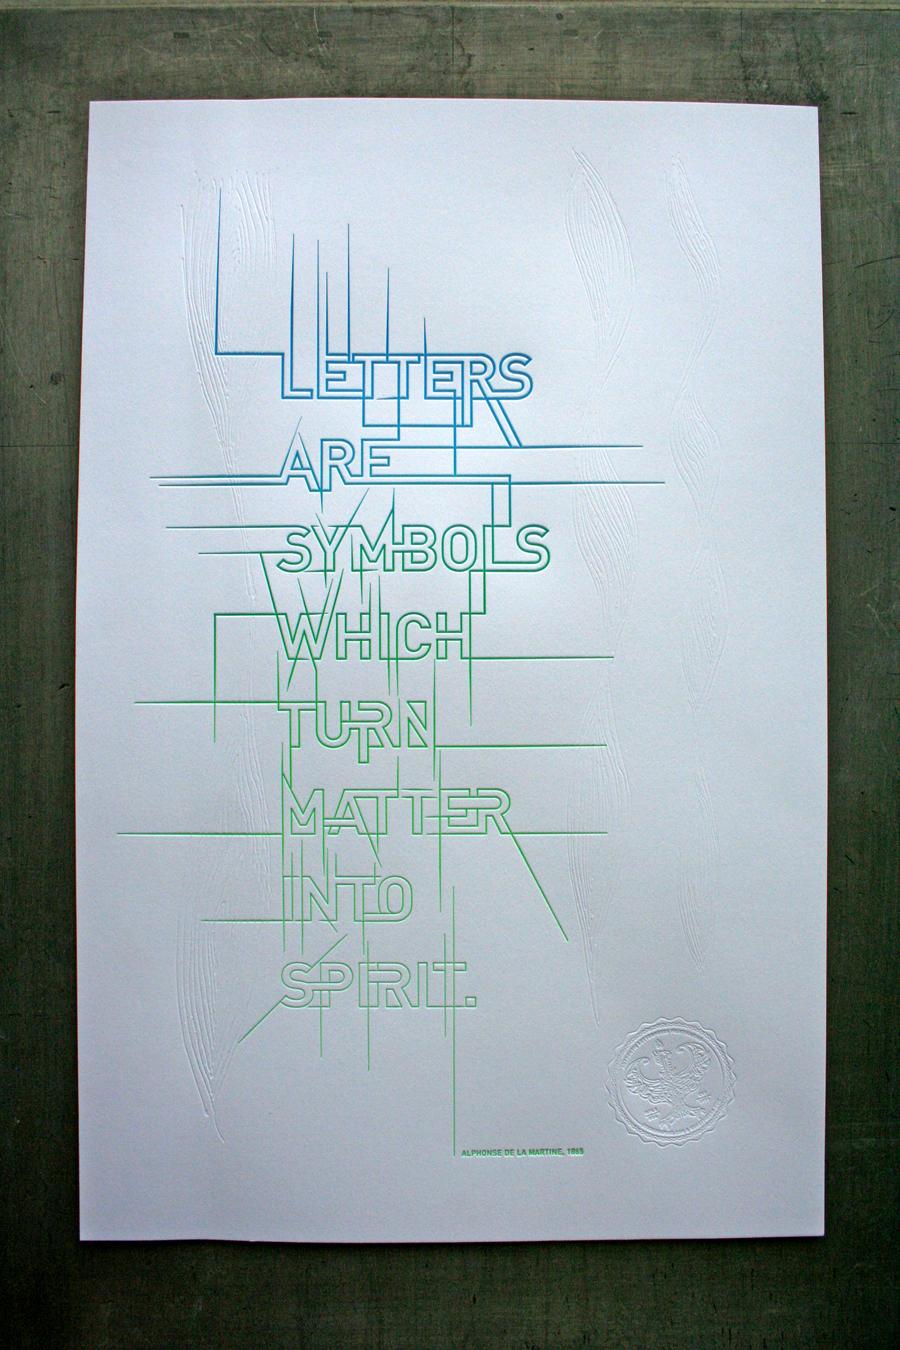 SOF_Matter_into_spirit_poster1.jpg